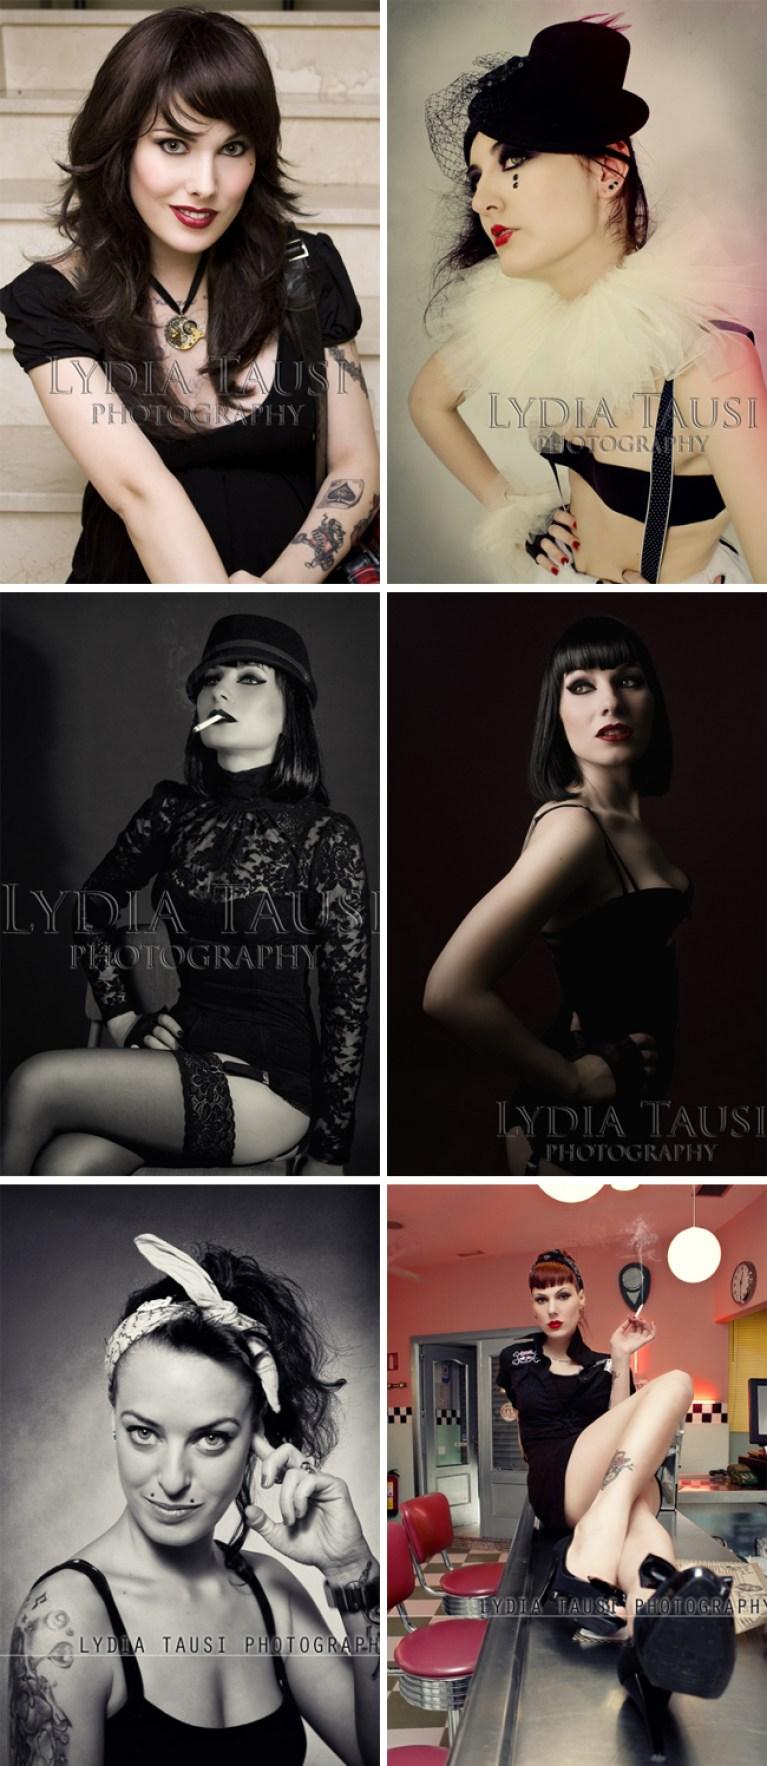 Lydia Tausi 2 Profesora fotografia digital Academia C10 Carlos Diez Madrid